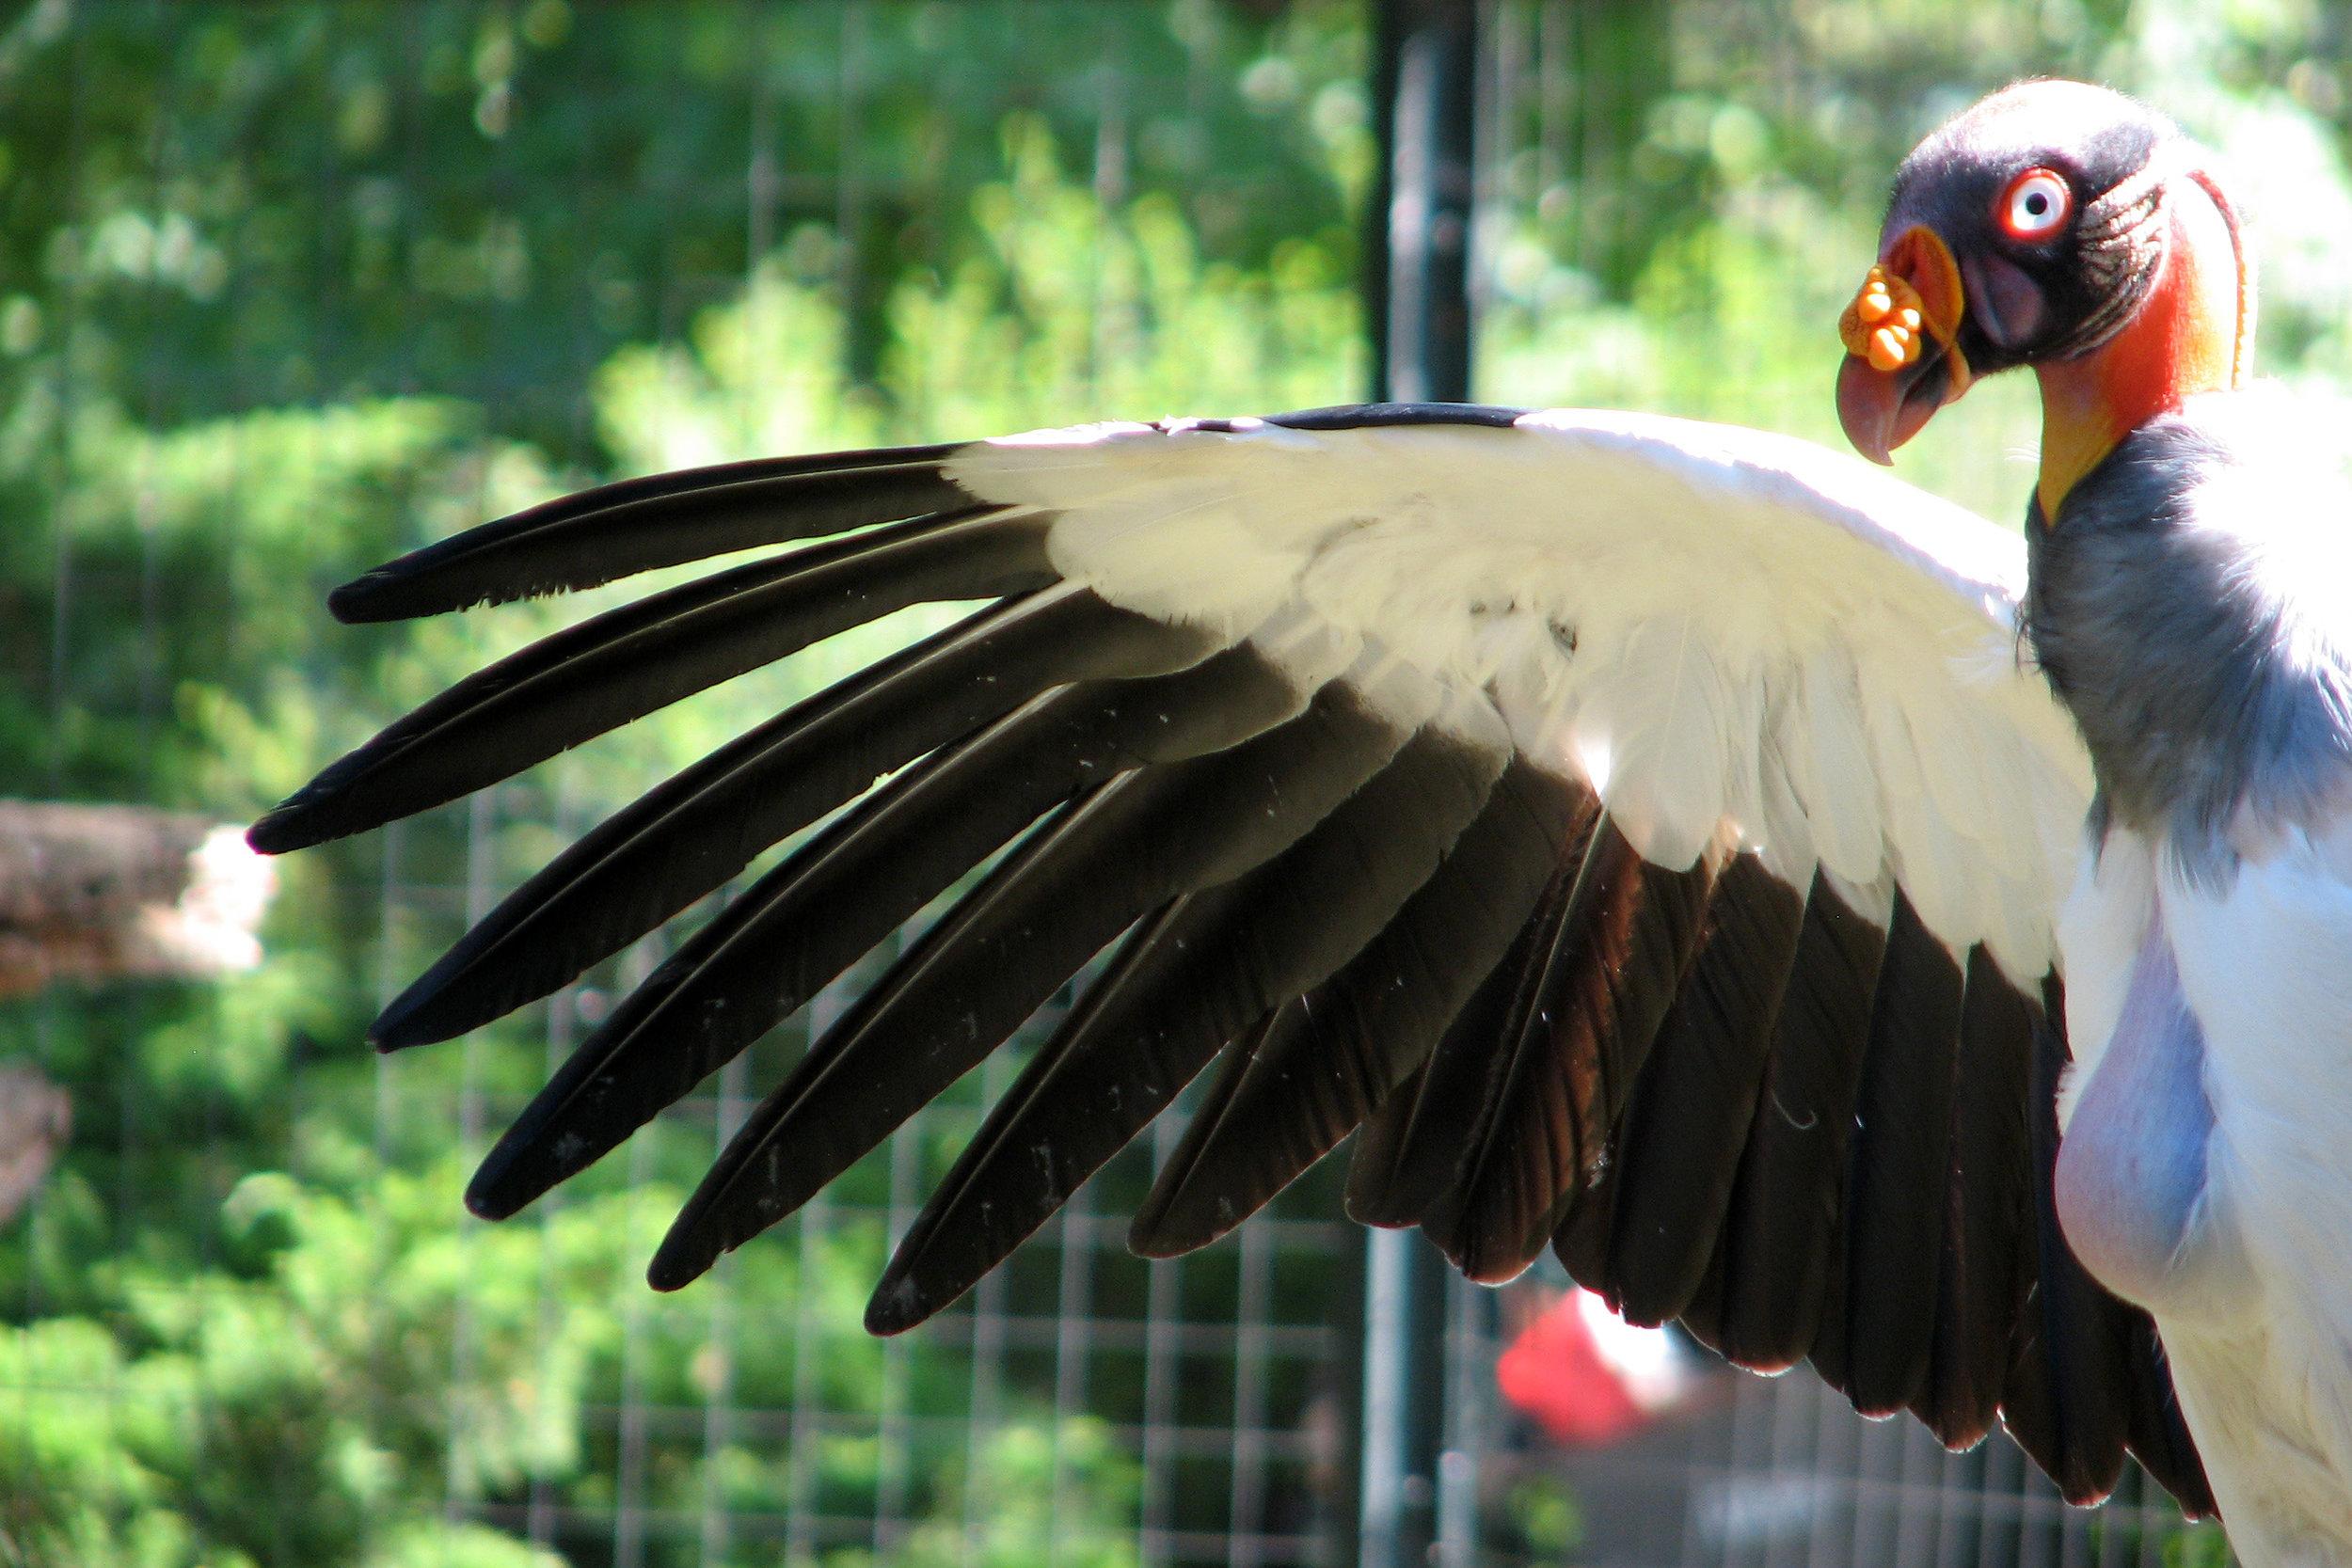 King Vulture. Image by  s shepherd via Wikimedia Commons